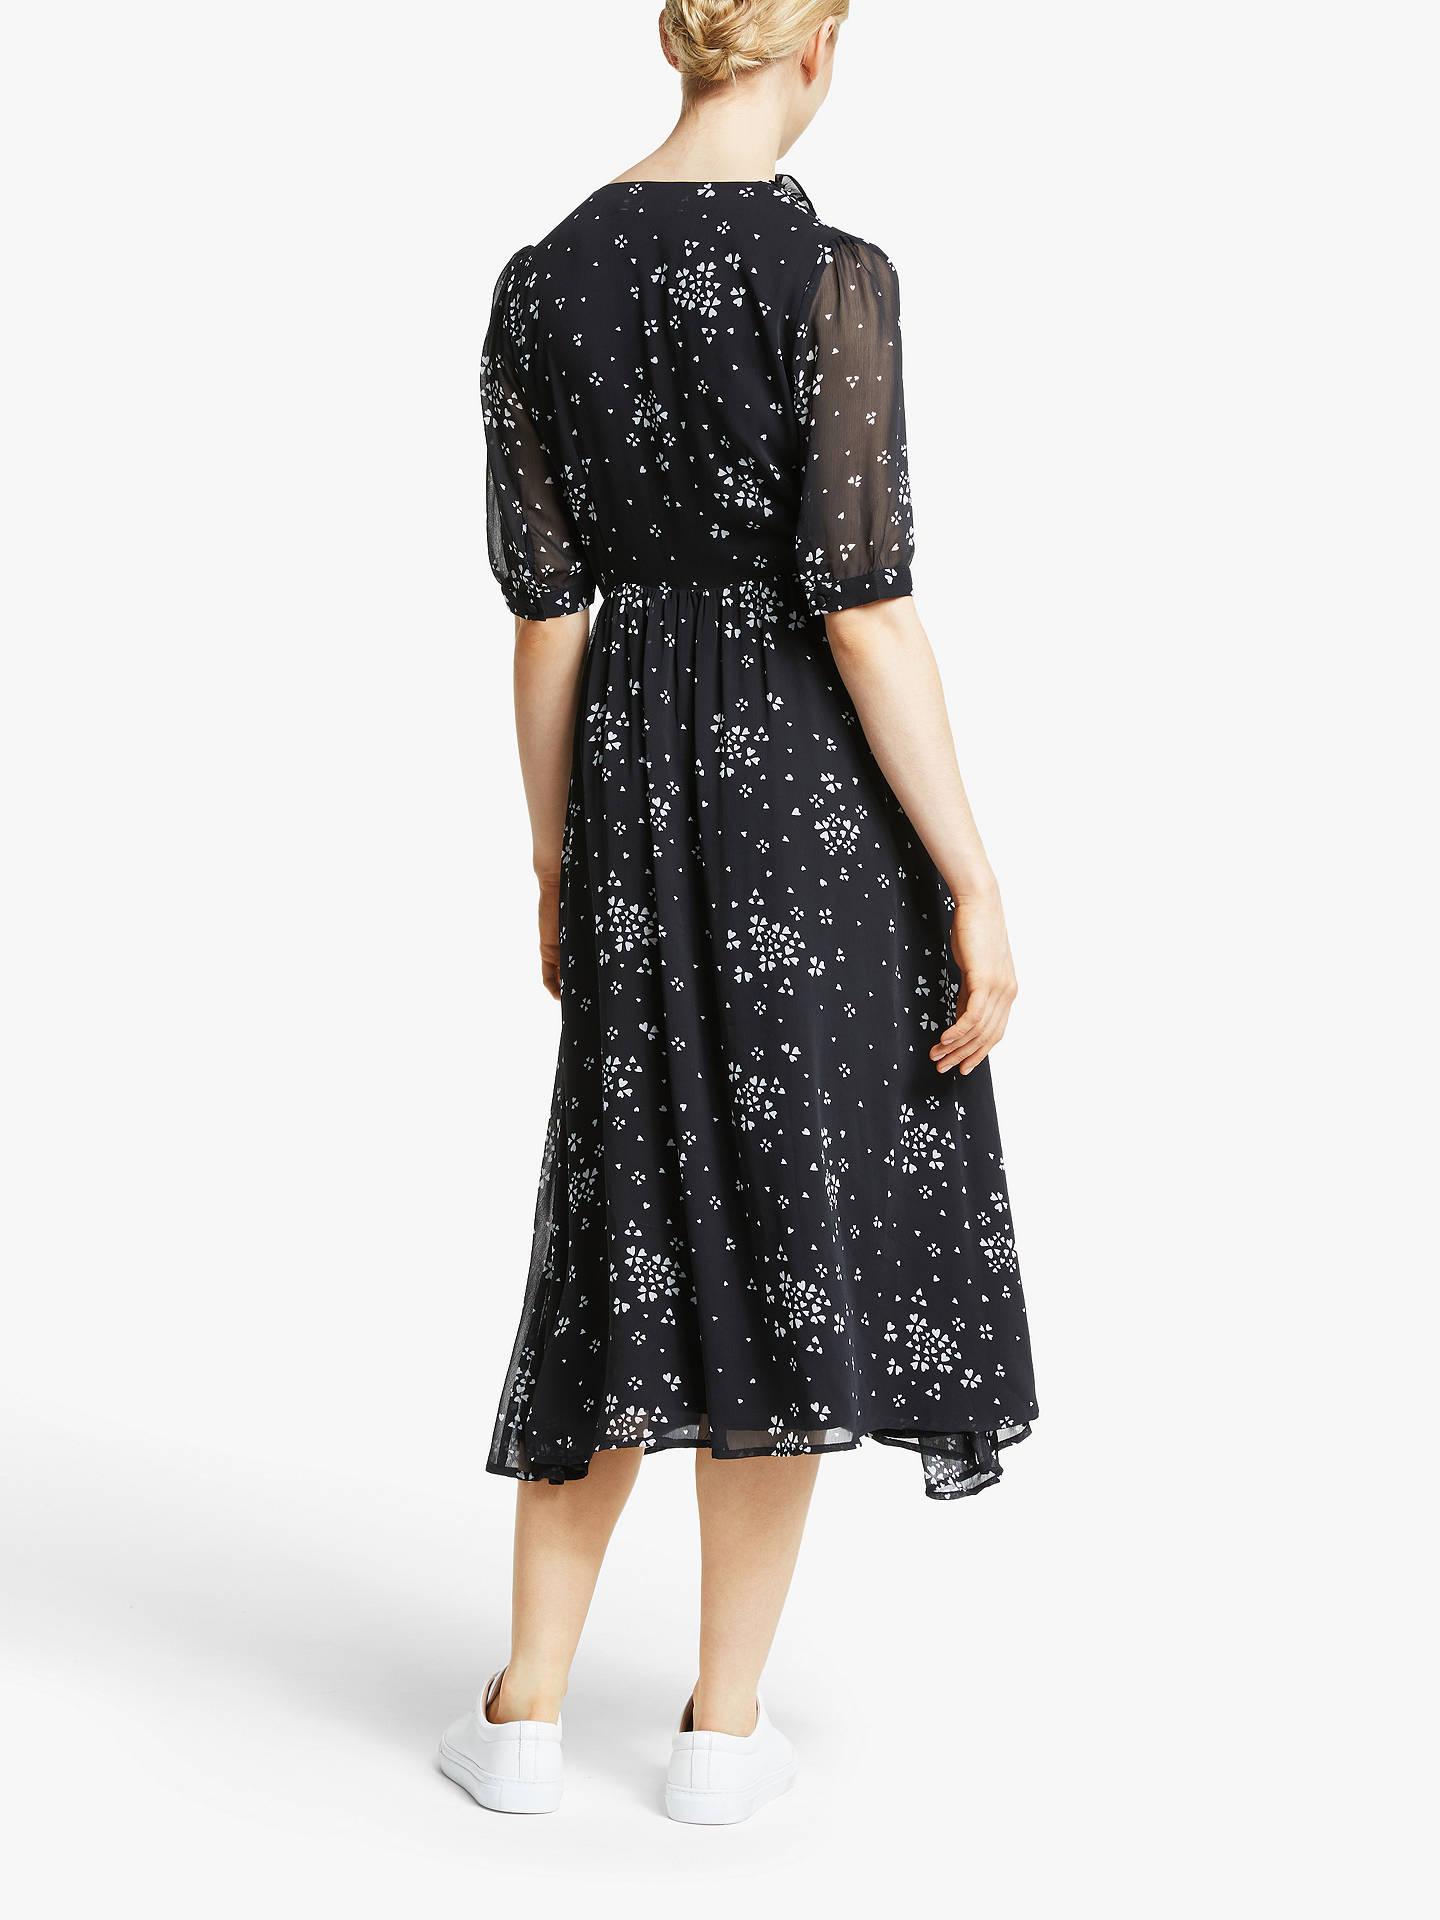 fa870fc4 ... Buy Gestuz Cindy Dress, Black, 8 Online at johnlewis.com ...